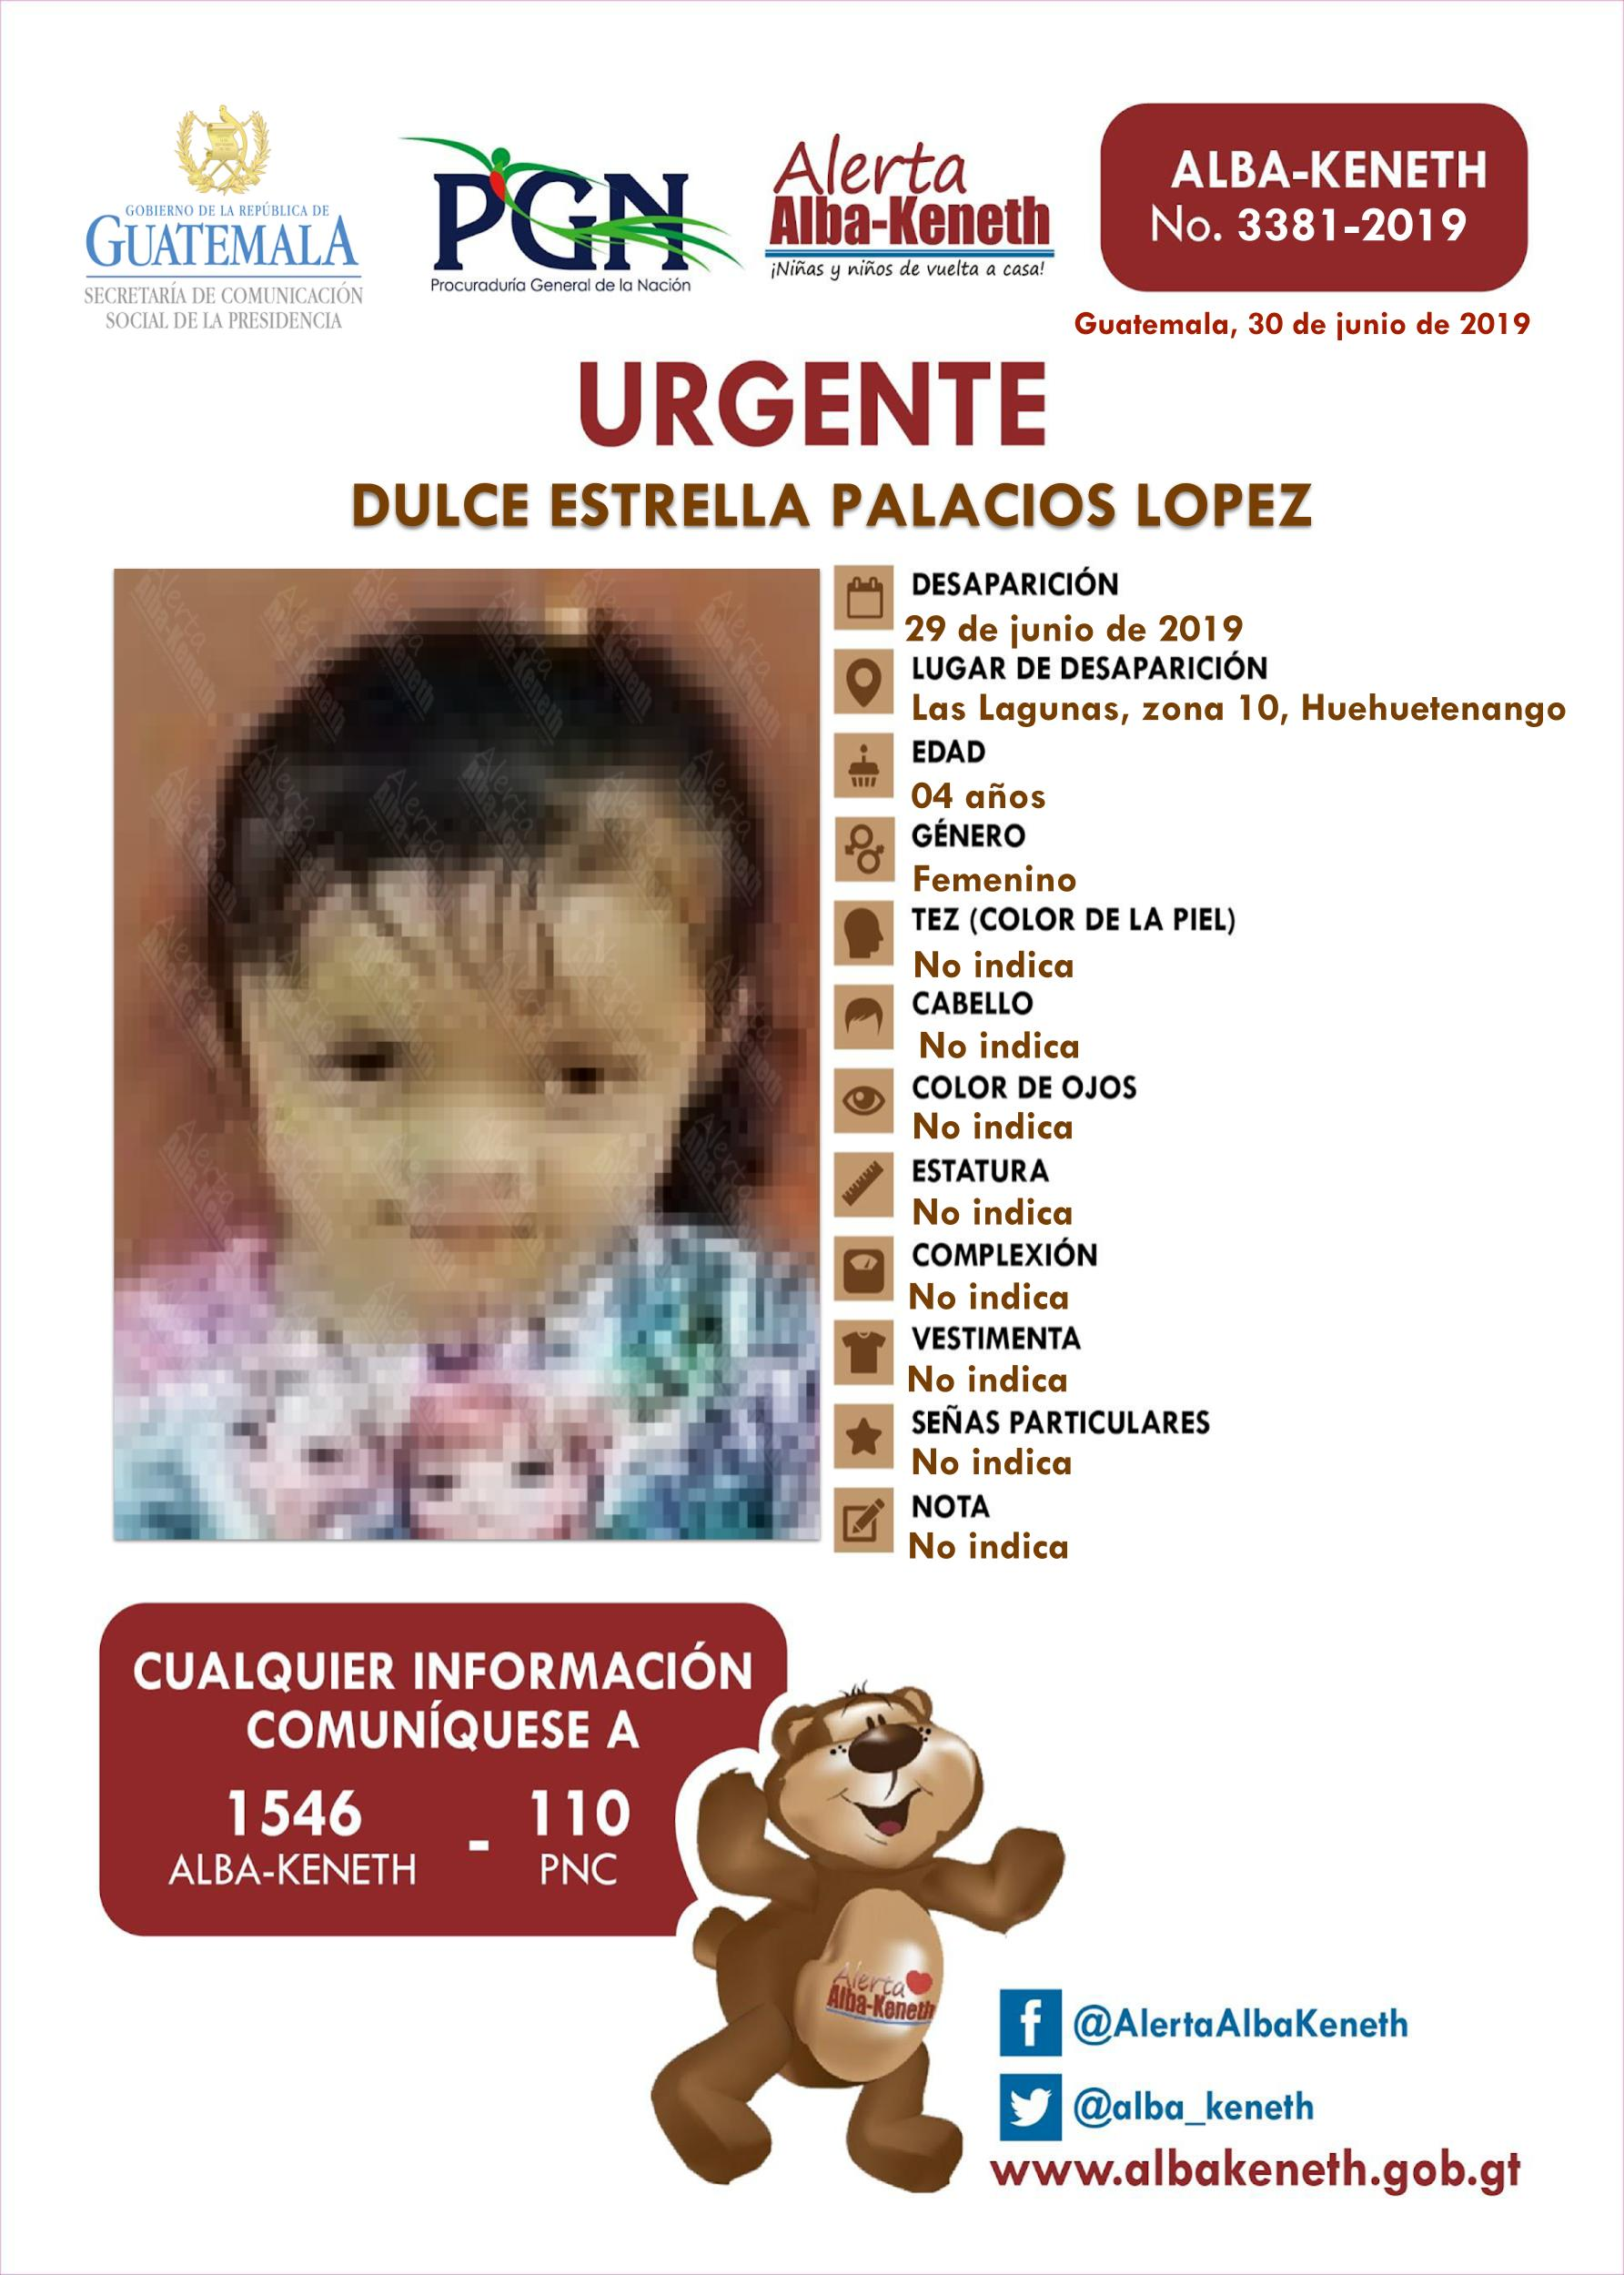 Dulce Estrella Palacios Lopez